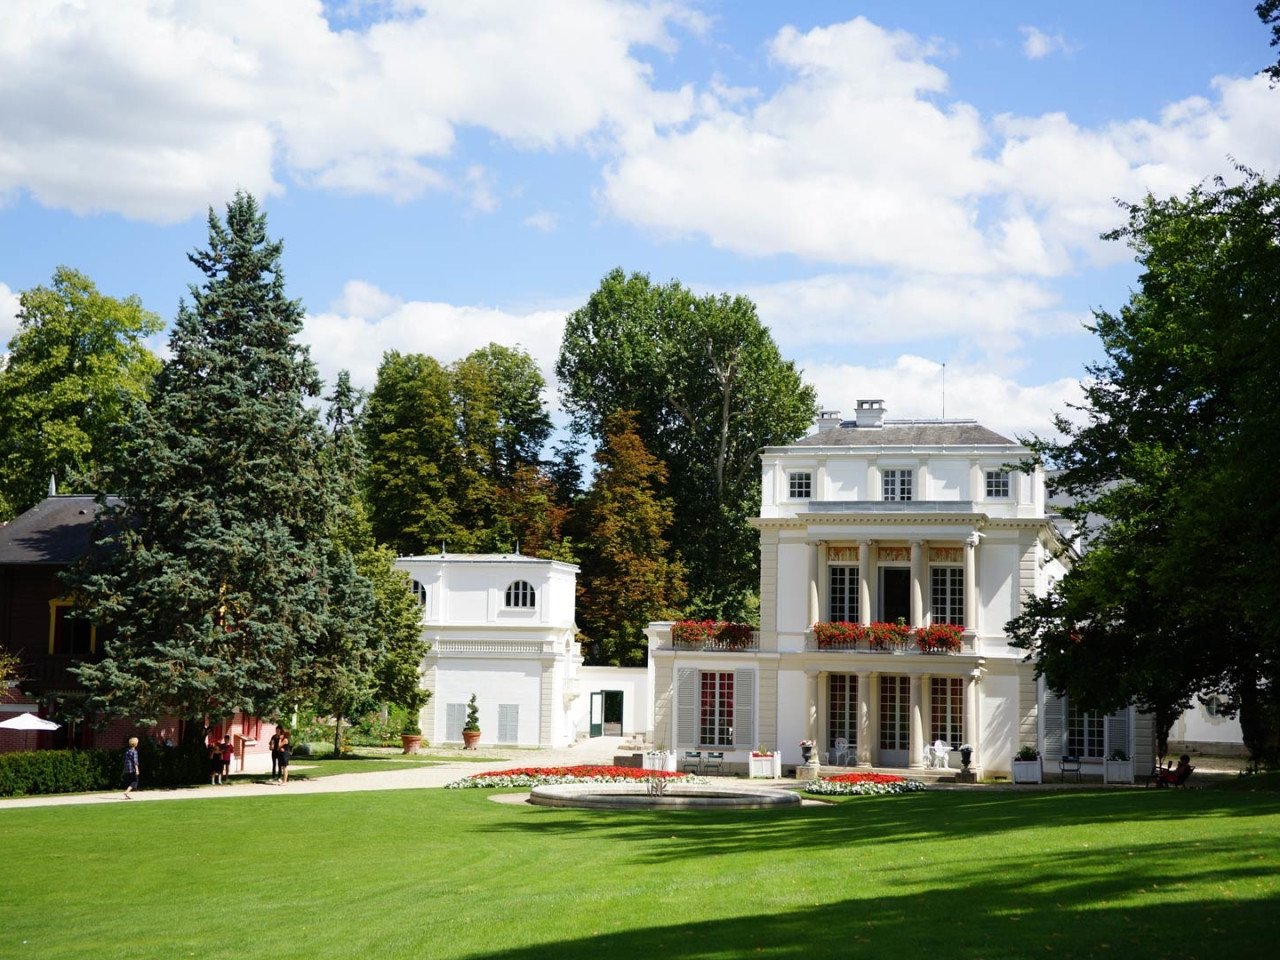 Visitare la proprietà Caillebotte a Yerres, vicino Parigi -  Parigi.it